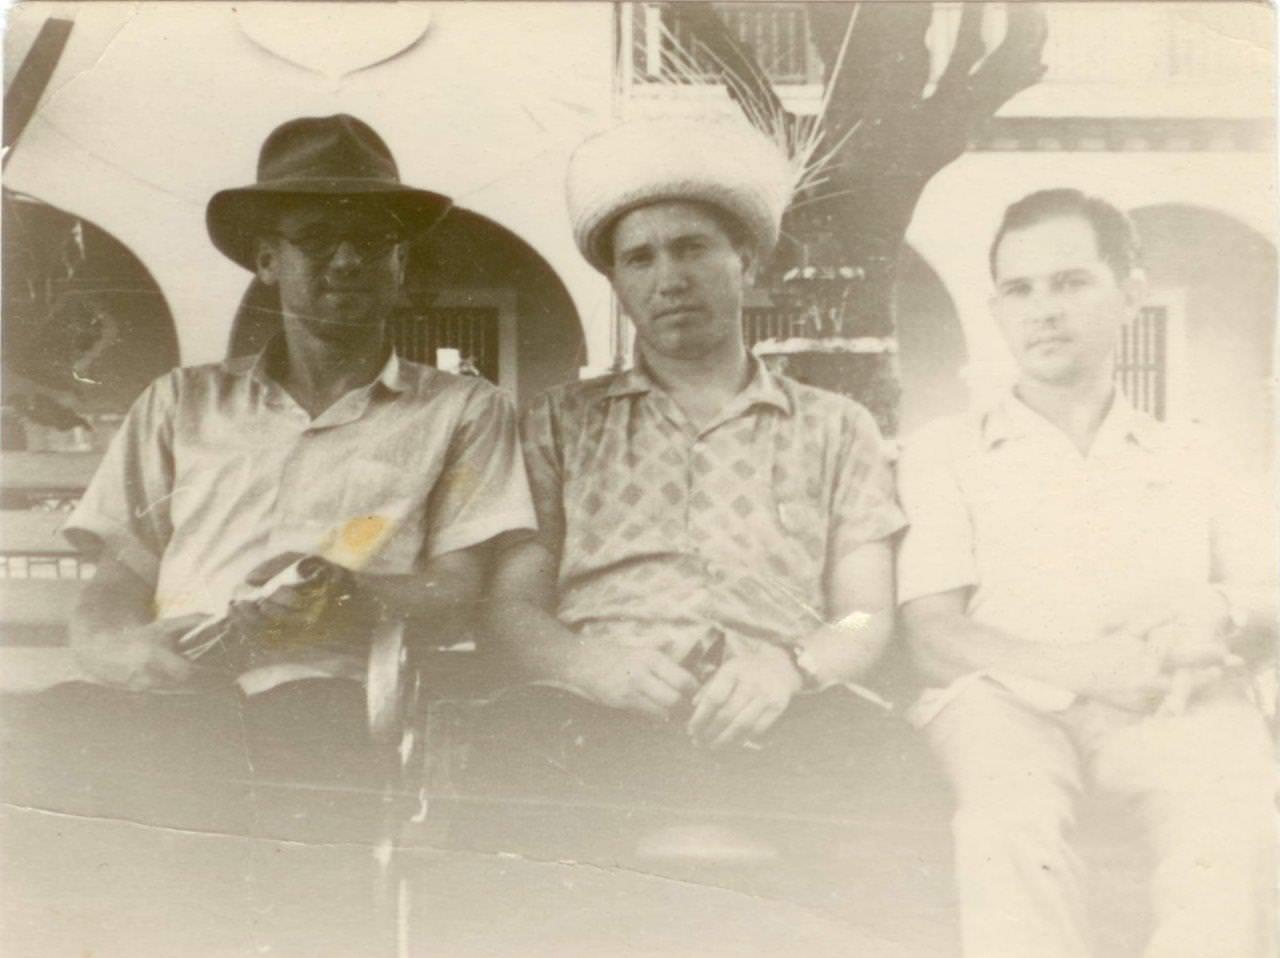 17. Шарапов Виктор Фролович (в центре), Сероносов Константин (слева) и Пряников Виталий на Кубе. Республика Куба. 1961-1962 гг.